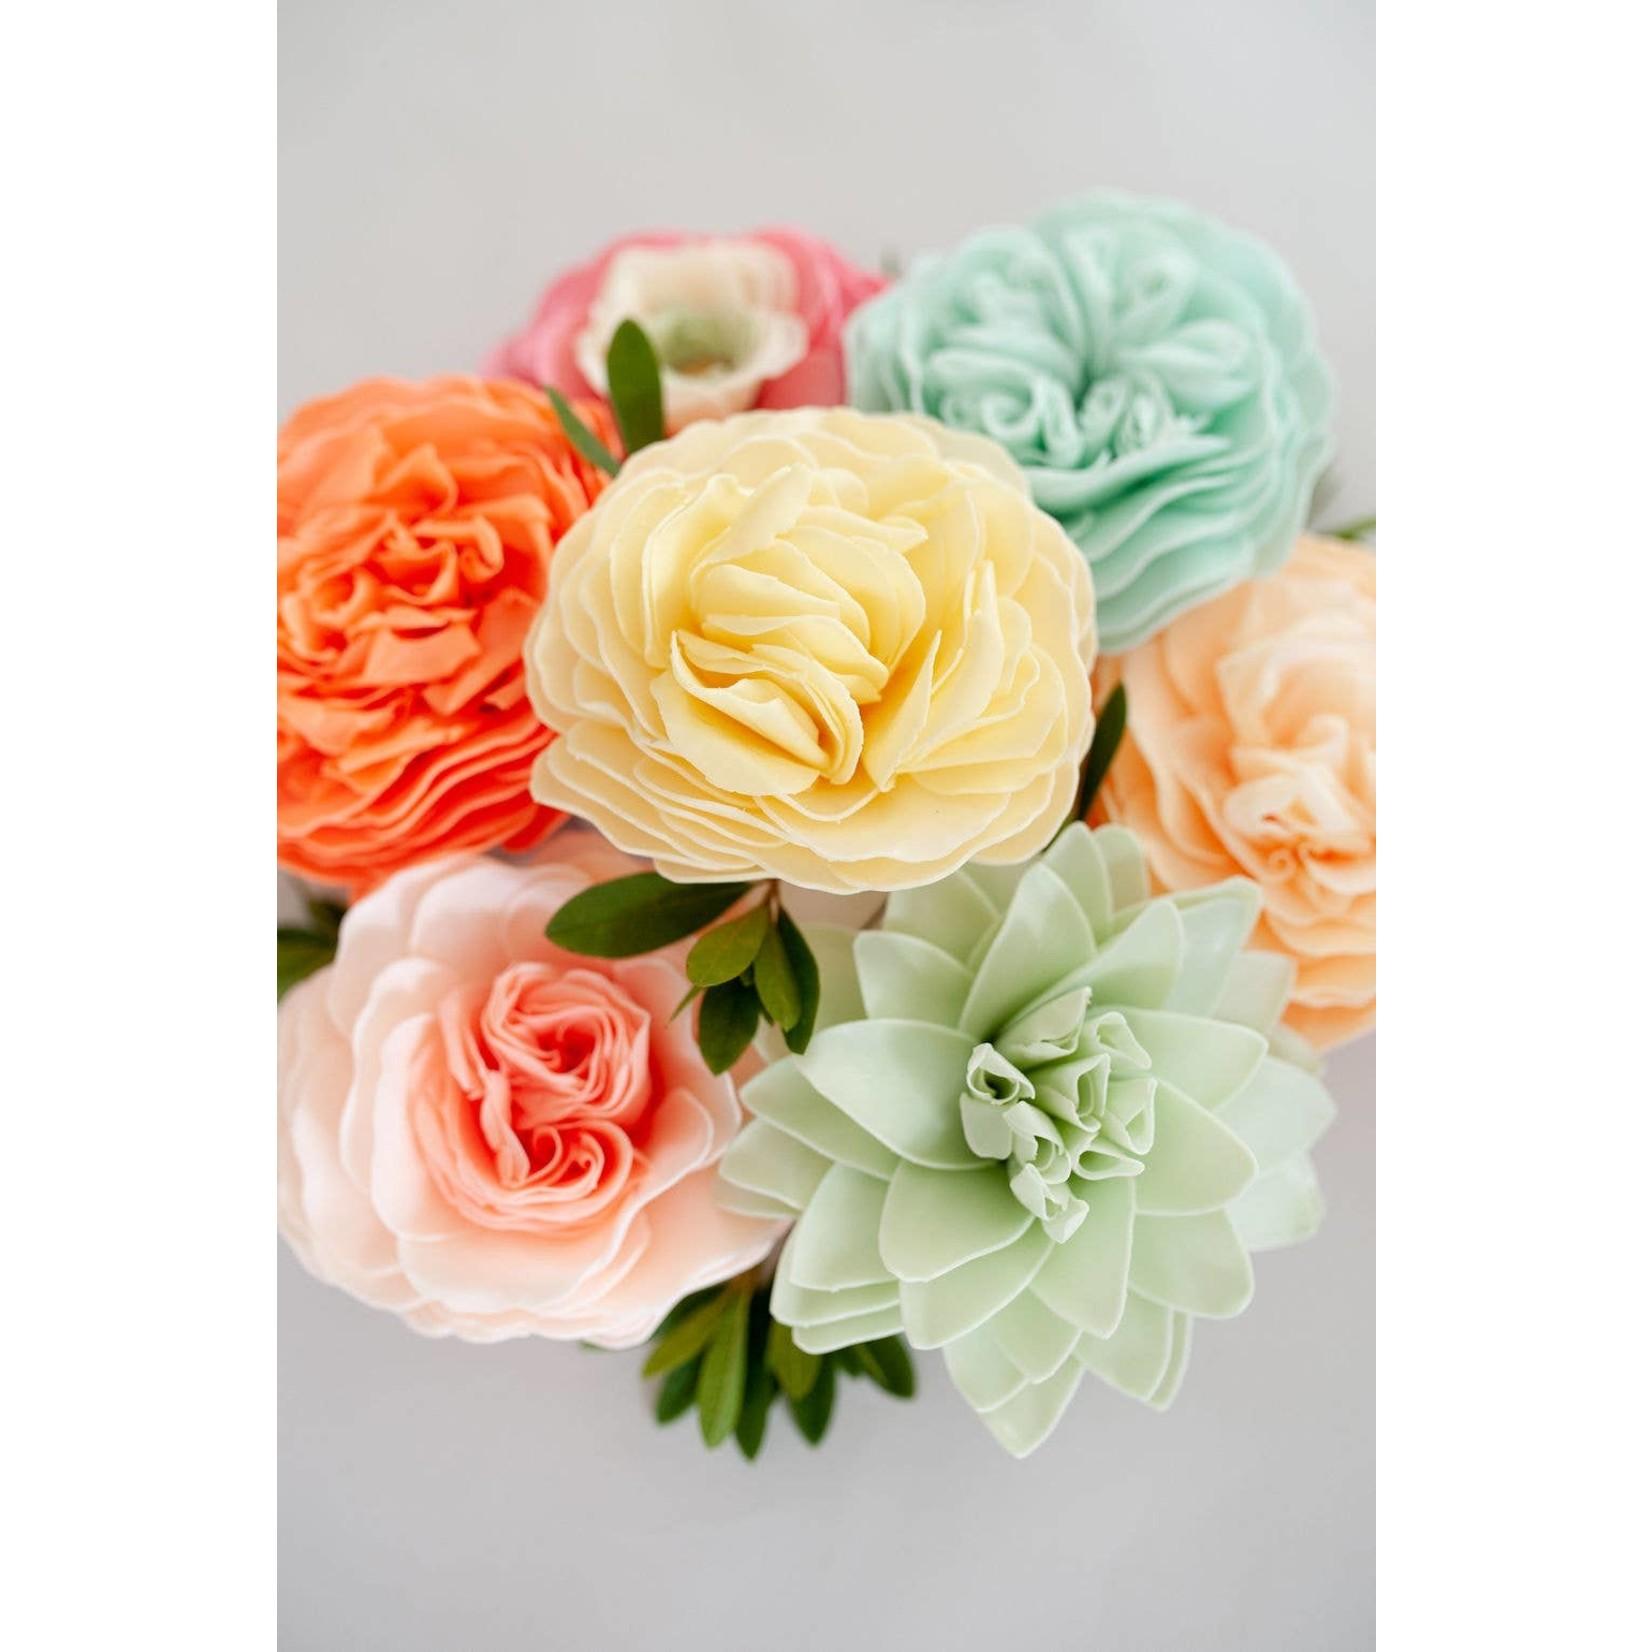 A'marie's Bath Flower Shop Forever Friends Bathing Petal Soap Flower